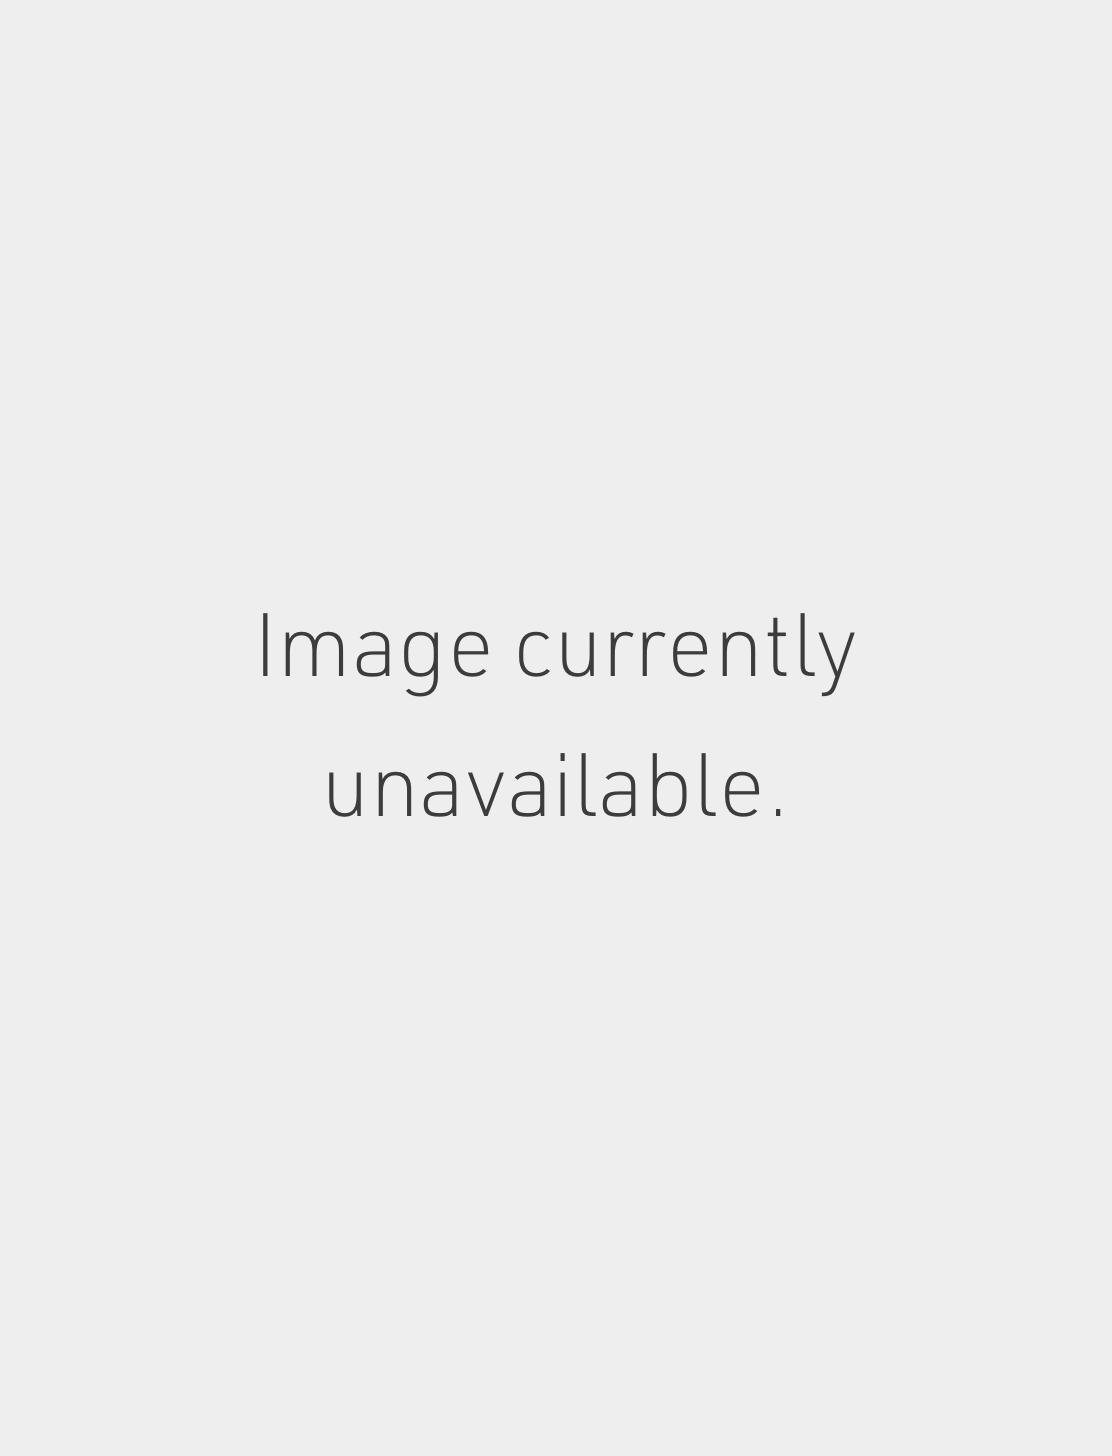 Opal/Dia Hilt Sword 5mm Blade Traditional Stud - WHITE GOLD - LEFT Image #1